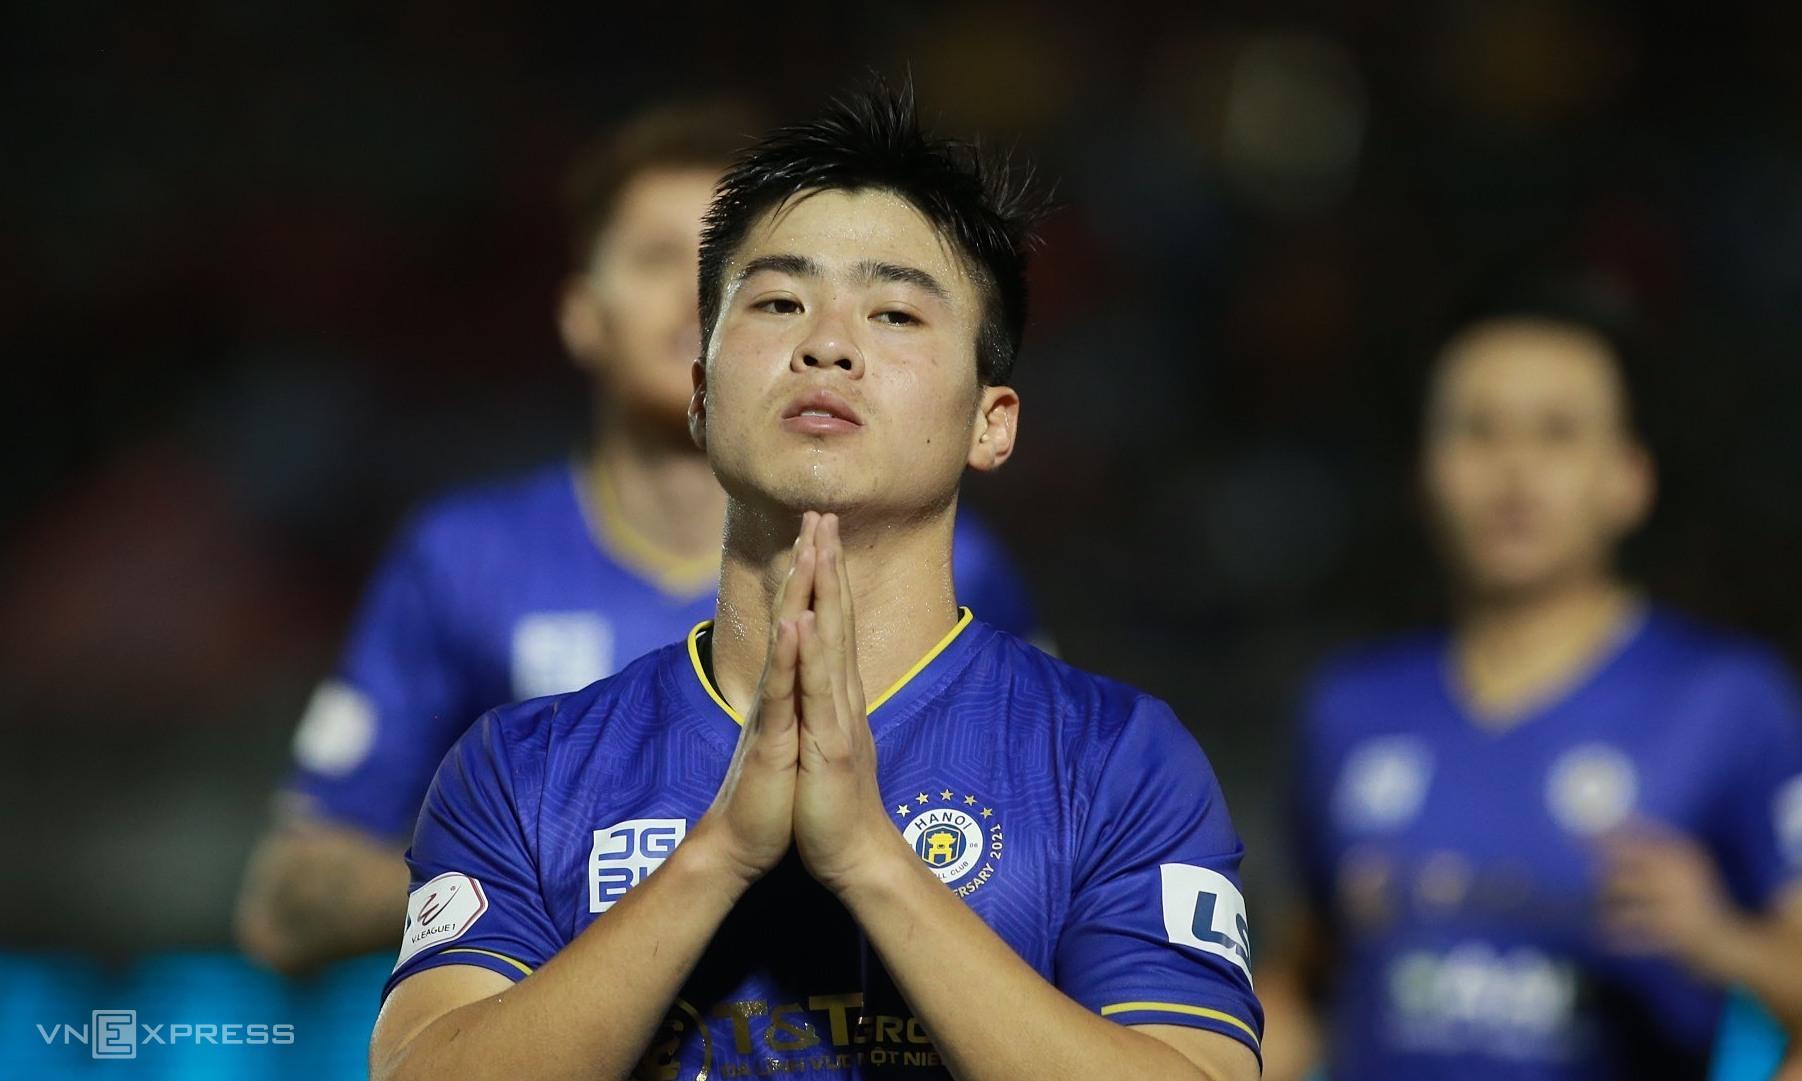 Duy Manh อธิษฐานเผื่อ Hung Dung หลังยิงประตูเปิดแต้มให้ฮานอย  ภาพ: ลำทอ